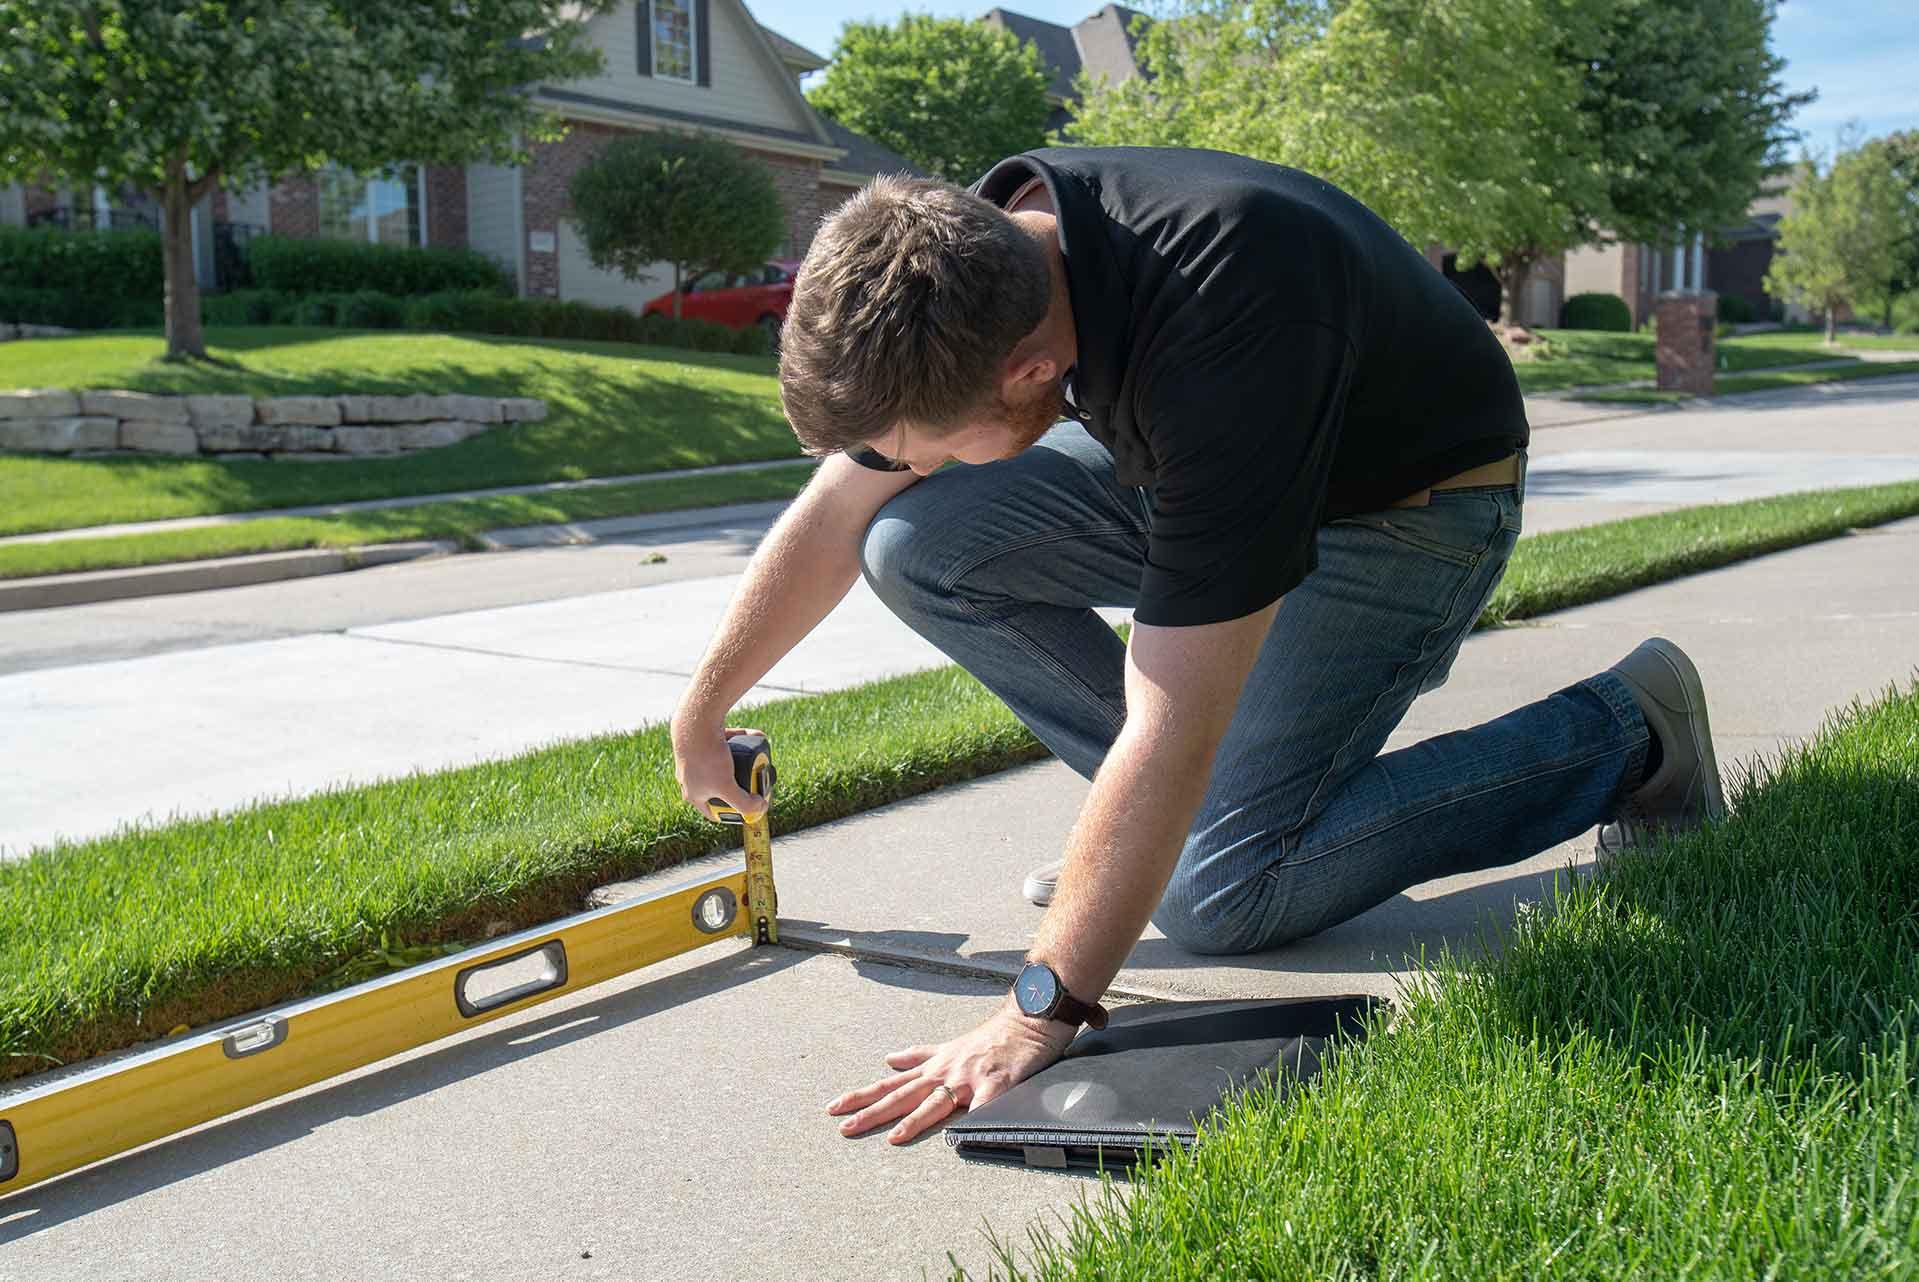 Leveling Concrete - Measure